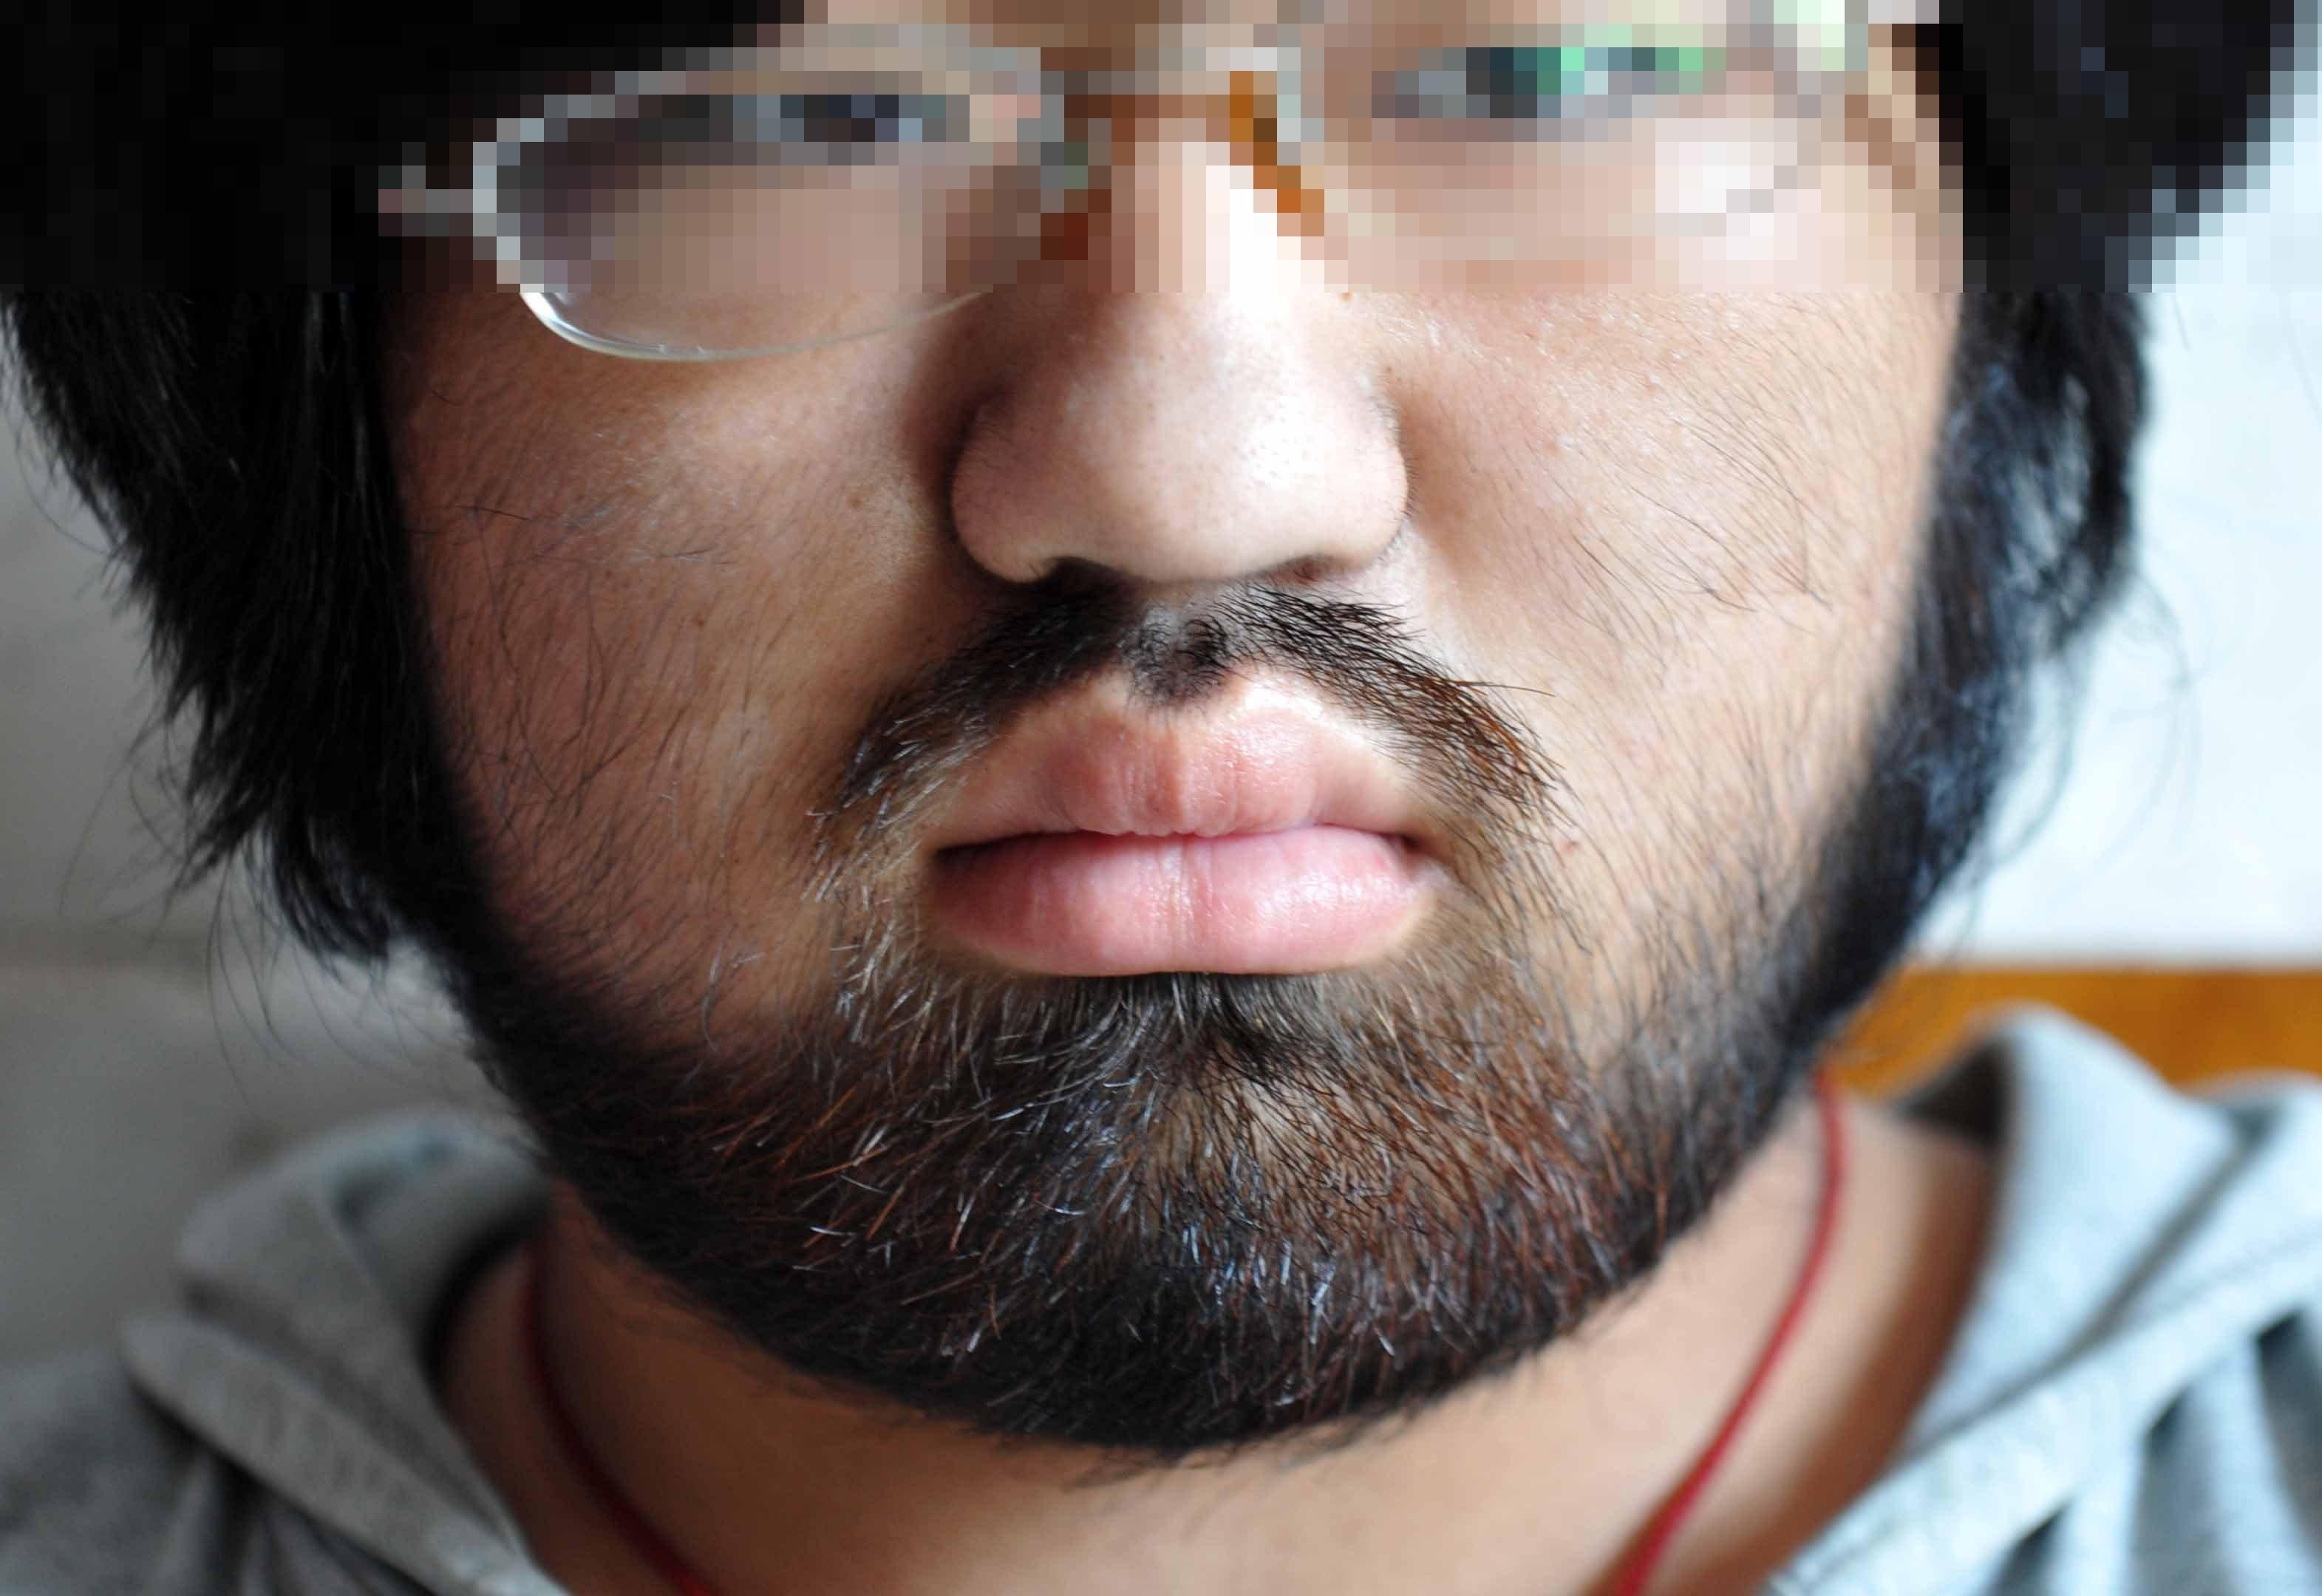 86eb740b466 16세 소녀 얼굴에 수염이...